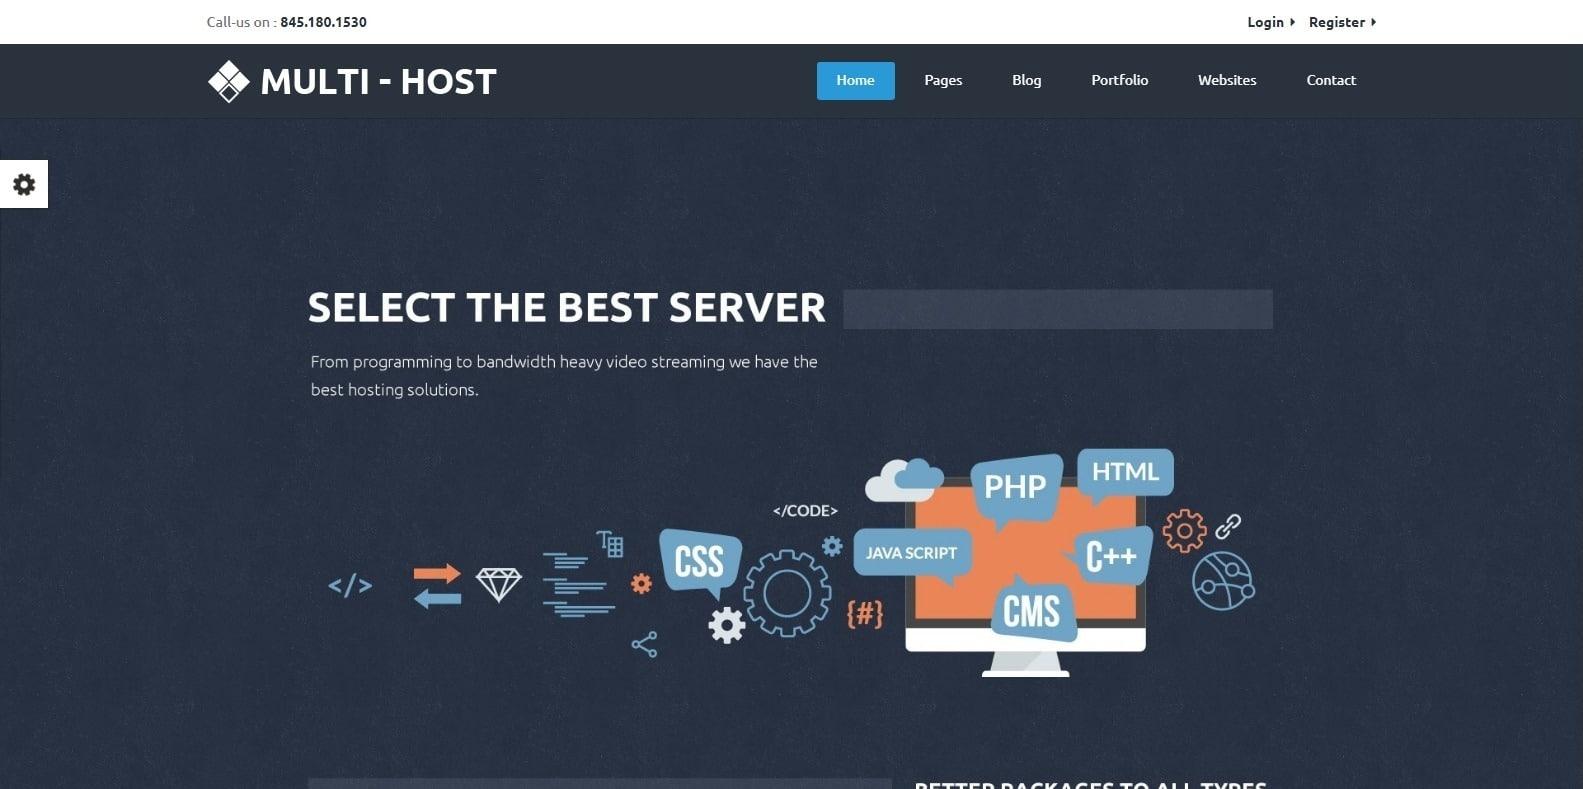 multihost-hosting-website-template